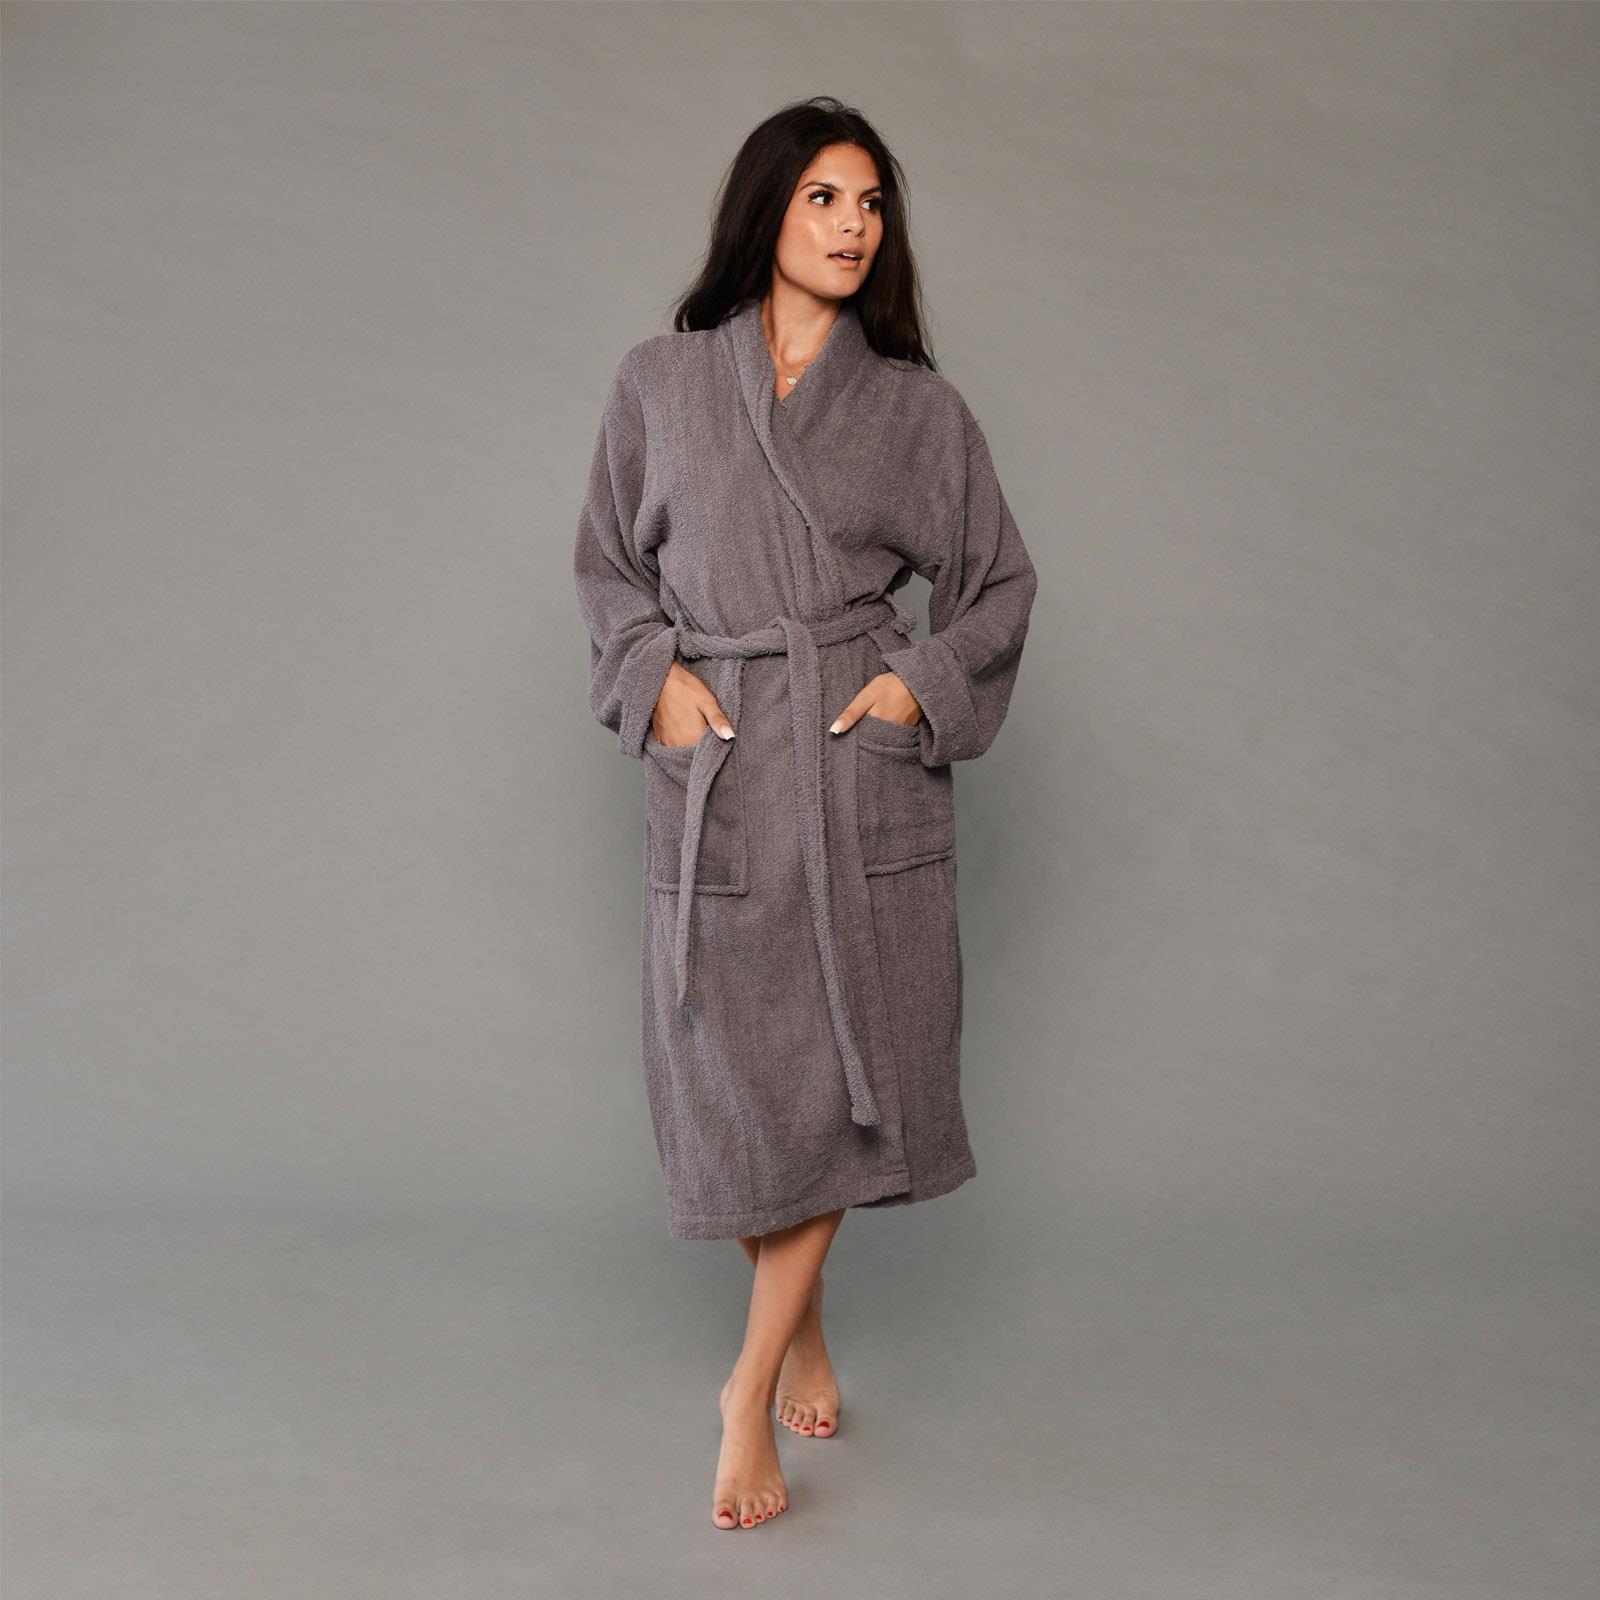 thumbnail 12 - Brentfords Luxury 100% Cotton Bath Robe Terry Towel Soft Dressing Gown Unisex